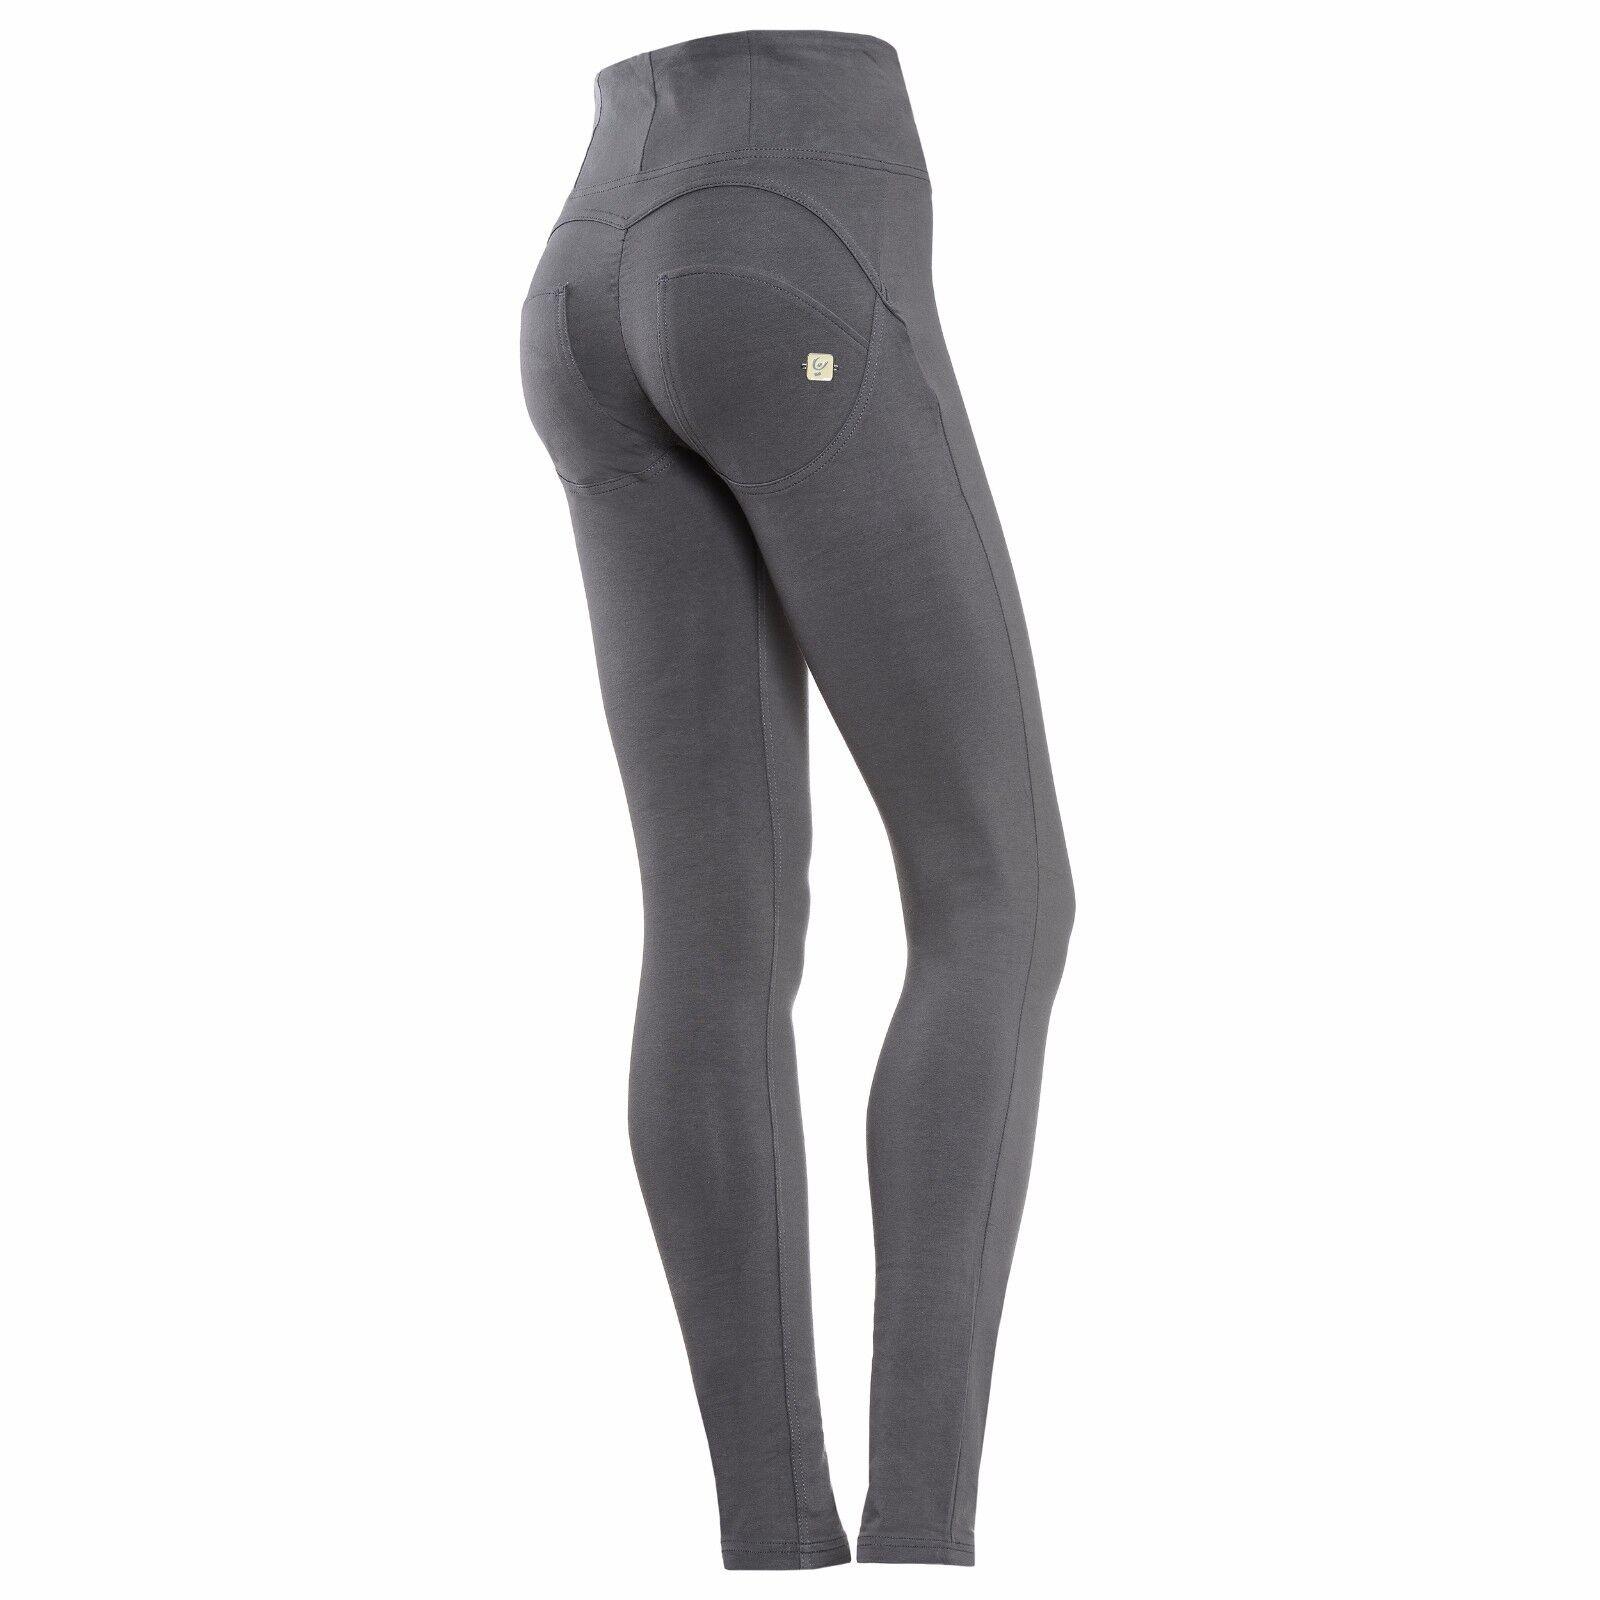 Freddy WRUP Body Shaping High Waist Women Fashion Pant Skinny Fit-Dark Grey NEW